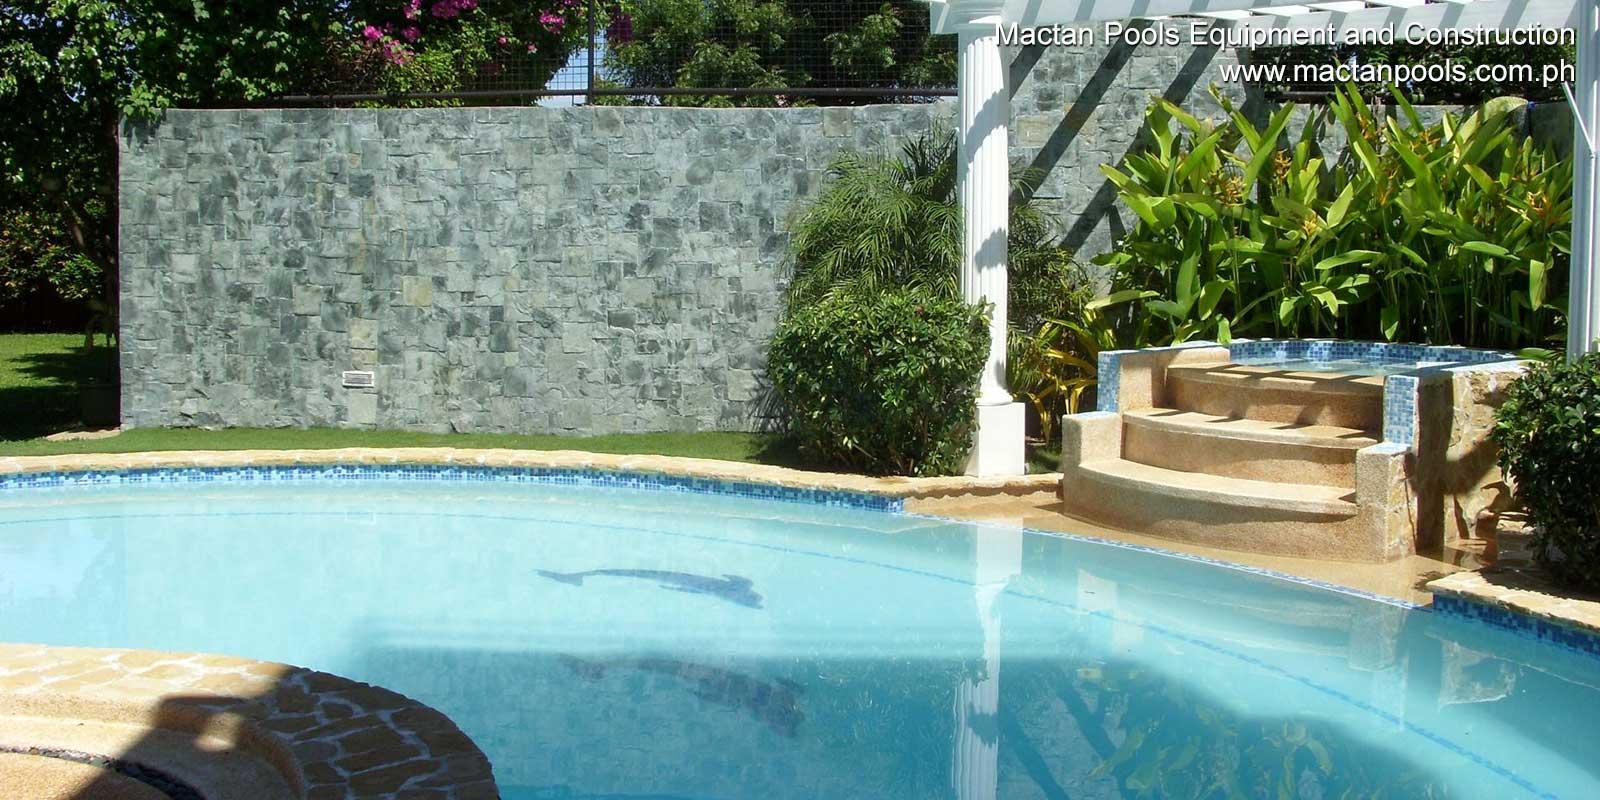 Swimming Pool Equipments Accessories Supplier In Mactan Cebu Philippines